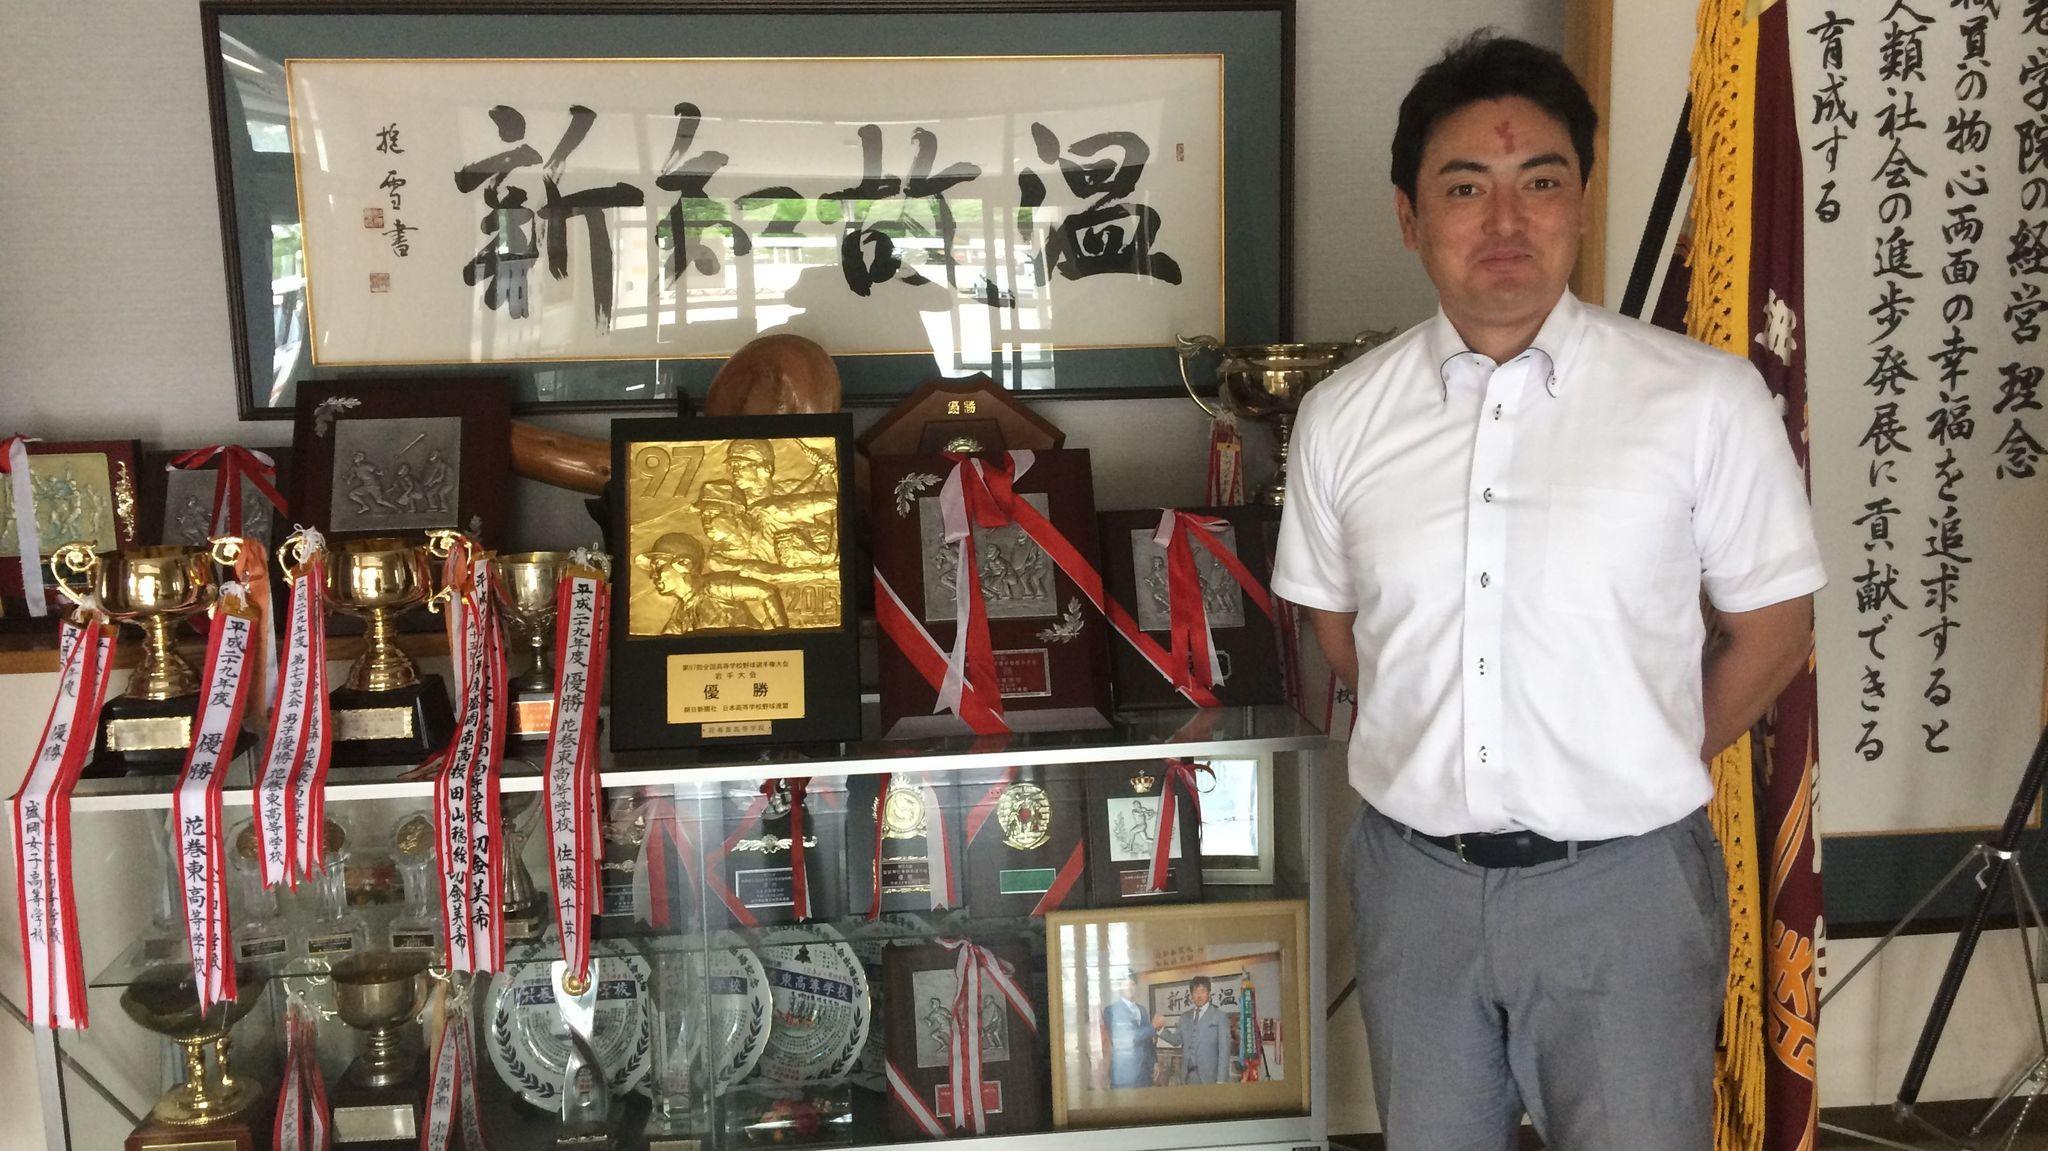 Japanese baseball star Shohei Ohtani could be double threat